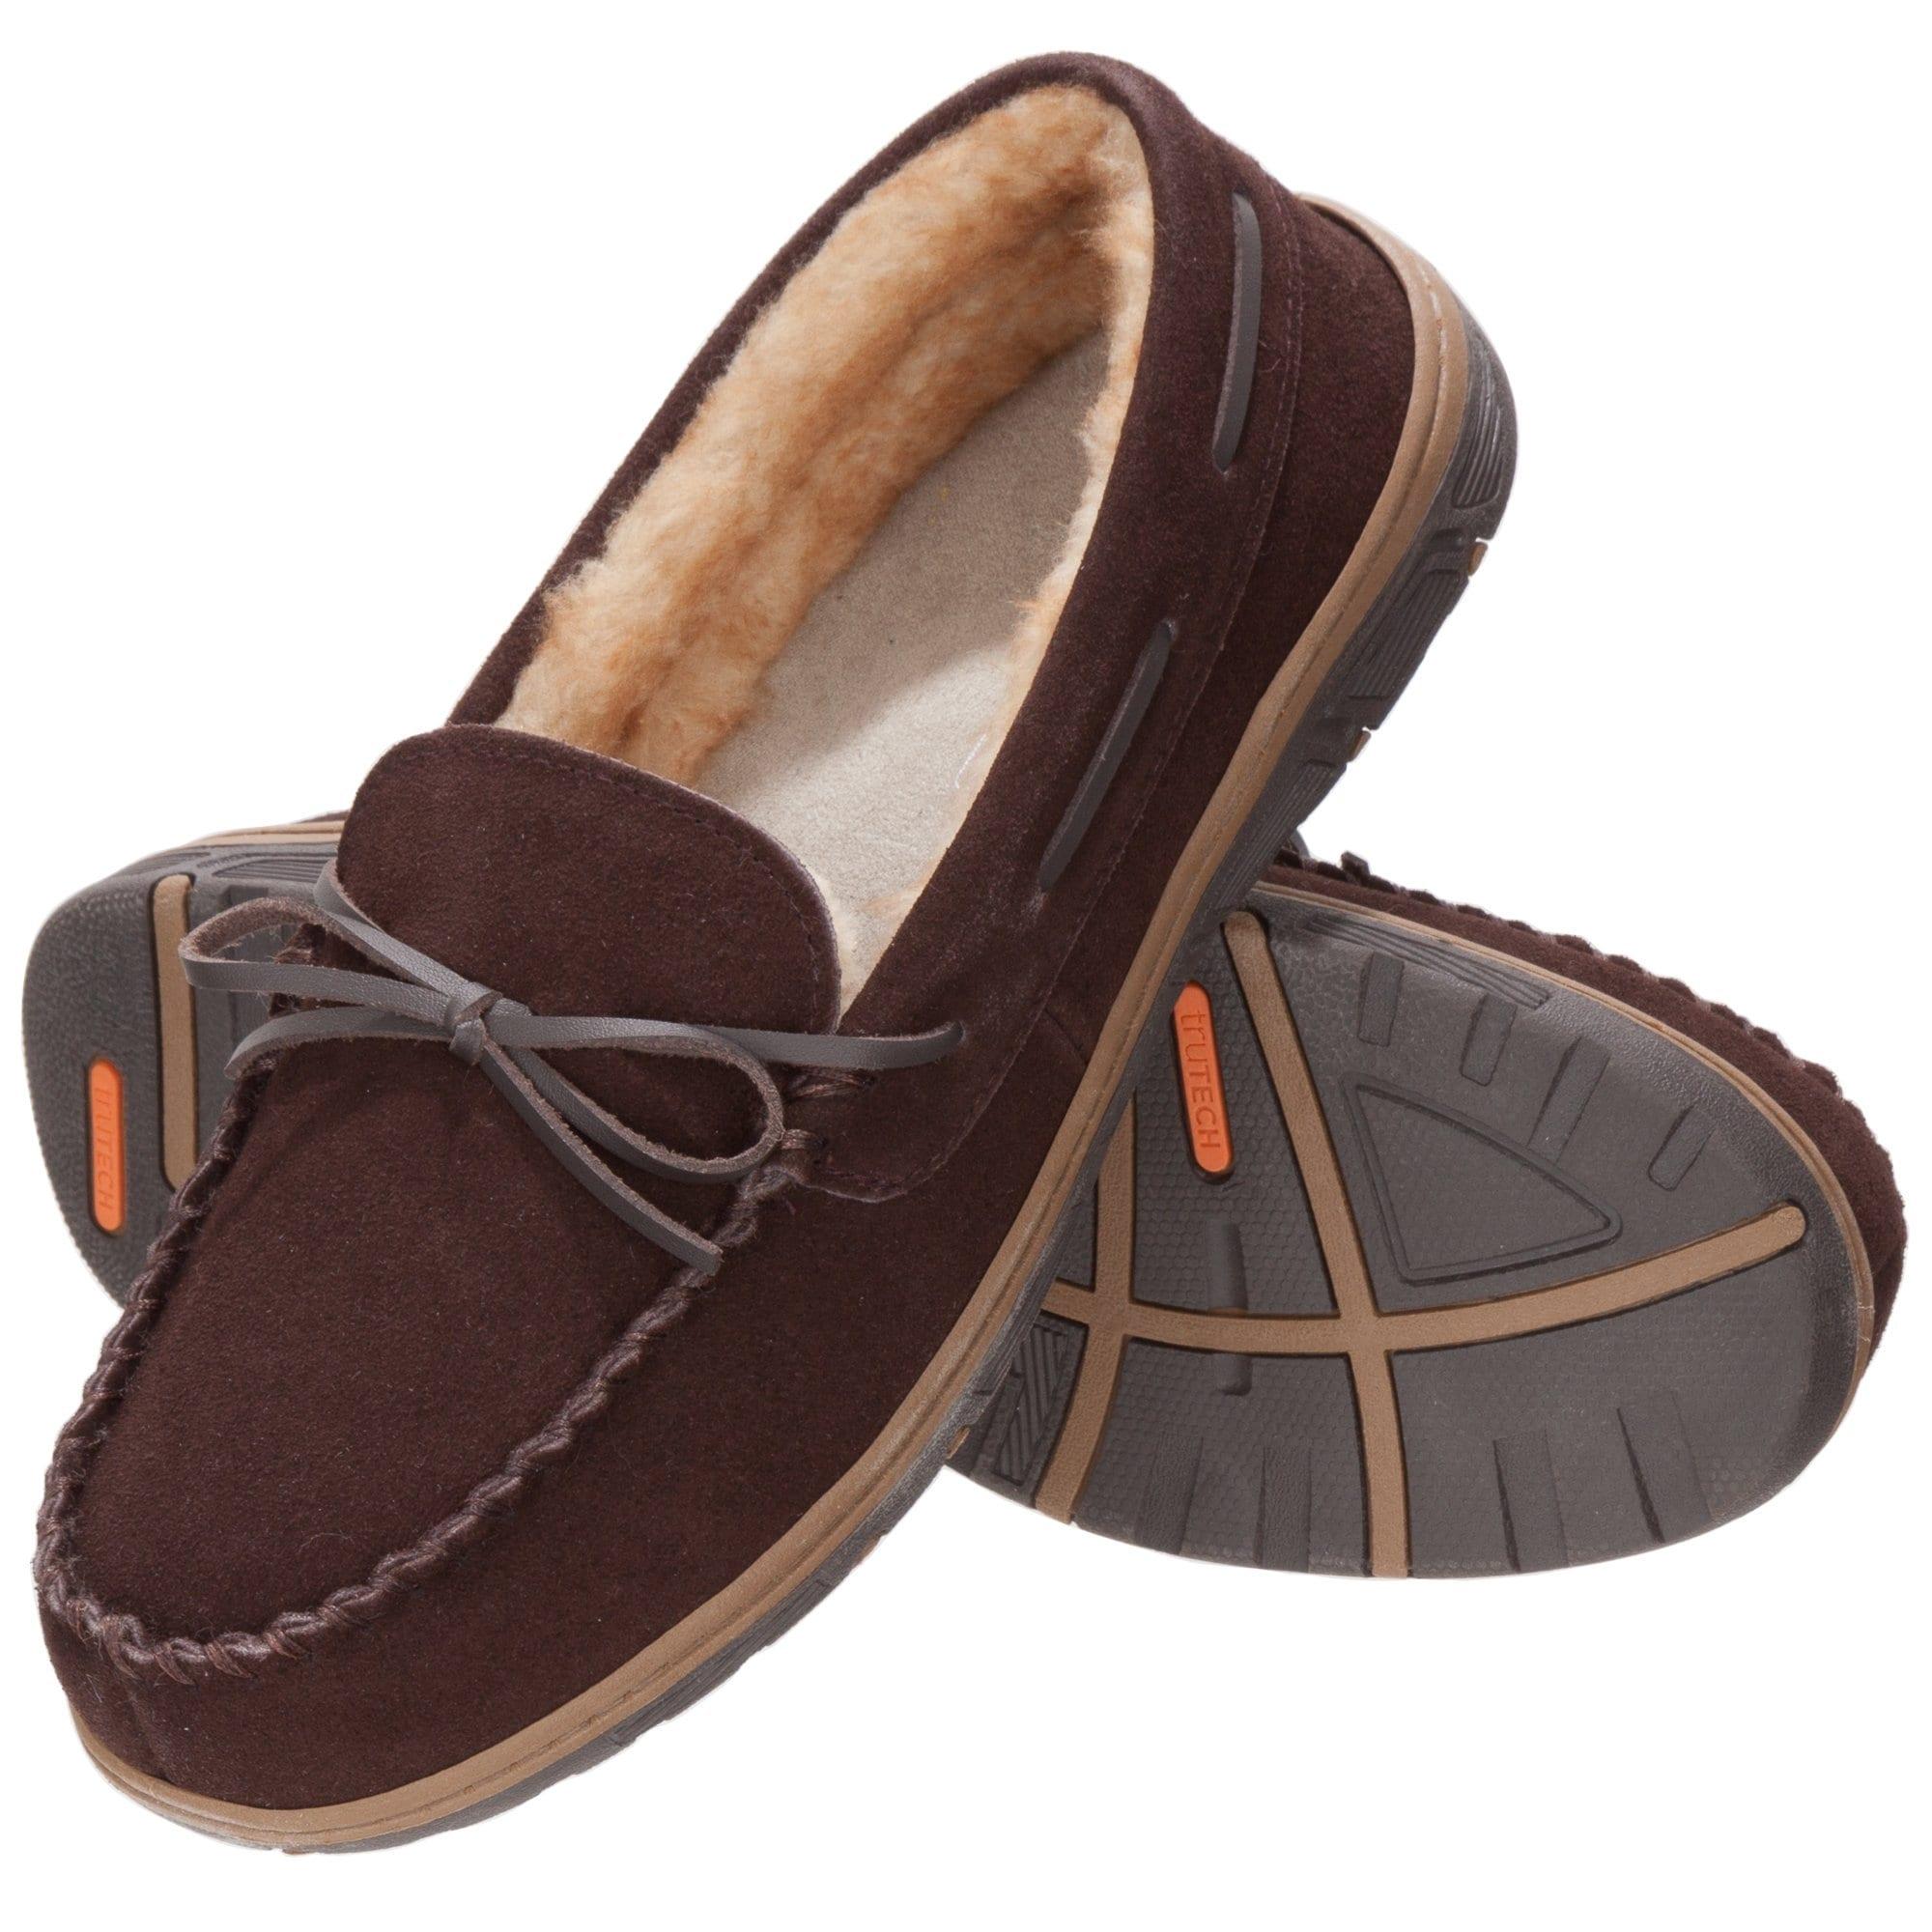 Shop Rockport TruTech NEW Brown Men's